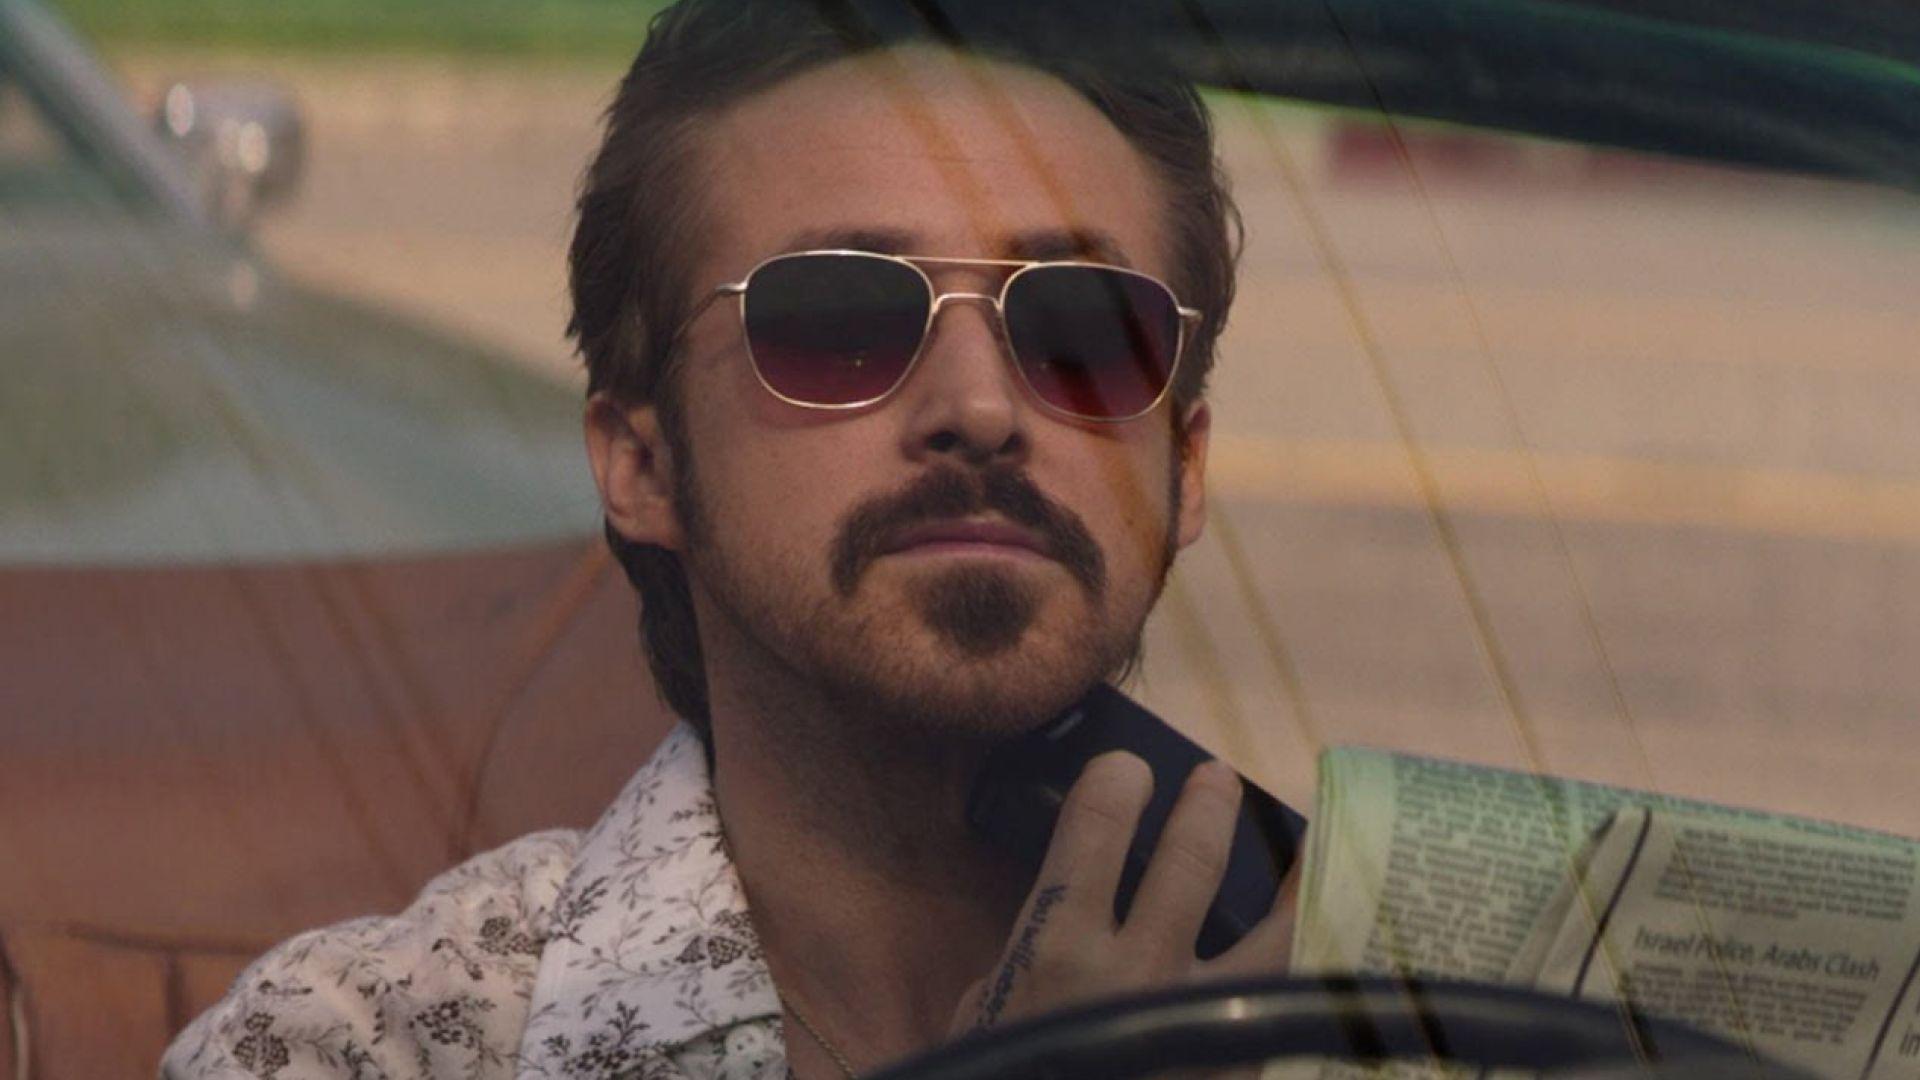 Official Trailer for 'The Nice Guys,' Starring Ryan Gosling,